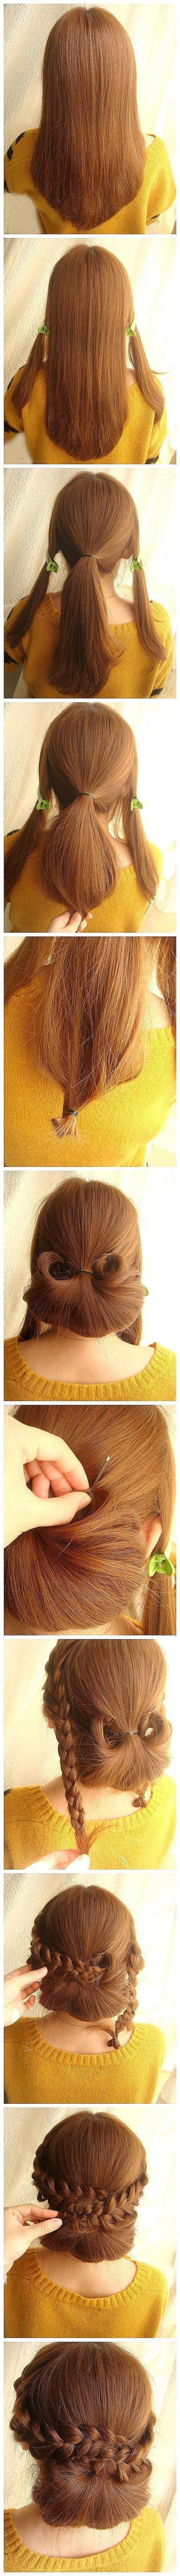 Braided Hair Model on Weddbook.  Source: Source :http://wantu.taobao.com/detail/9344240?u=349079728